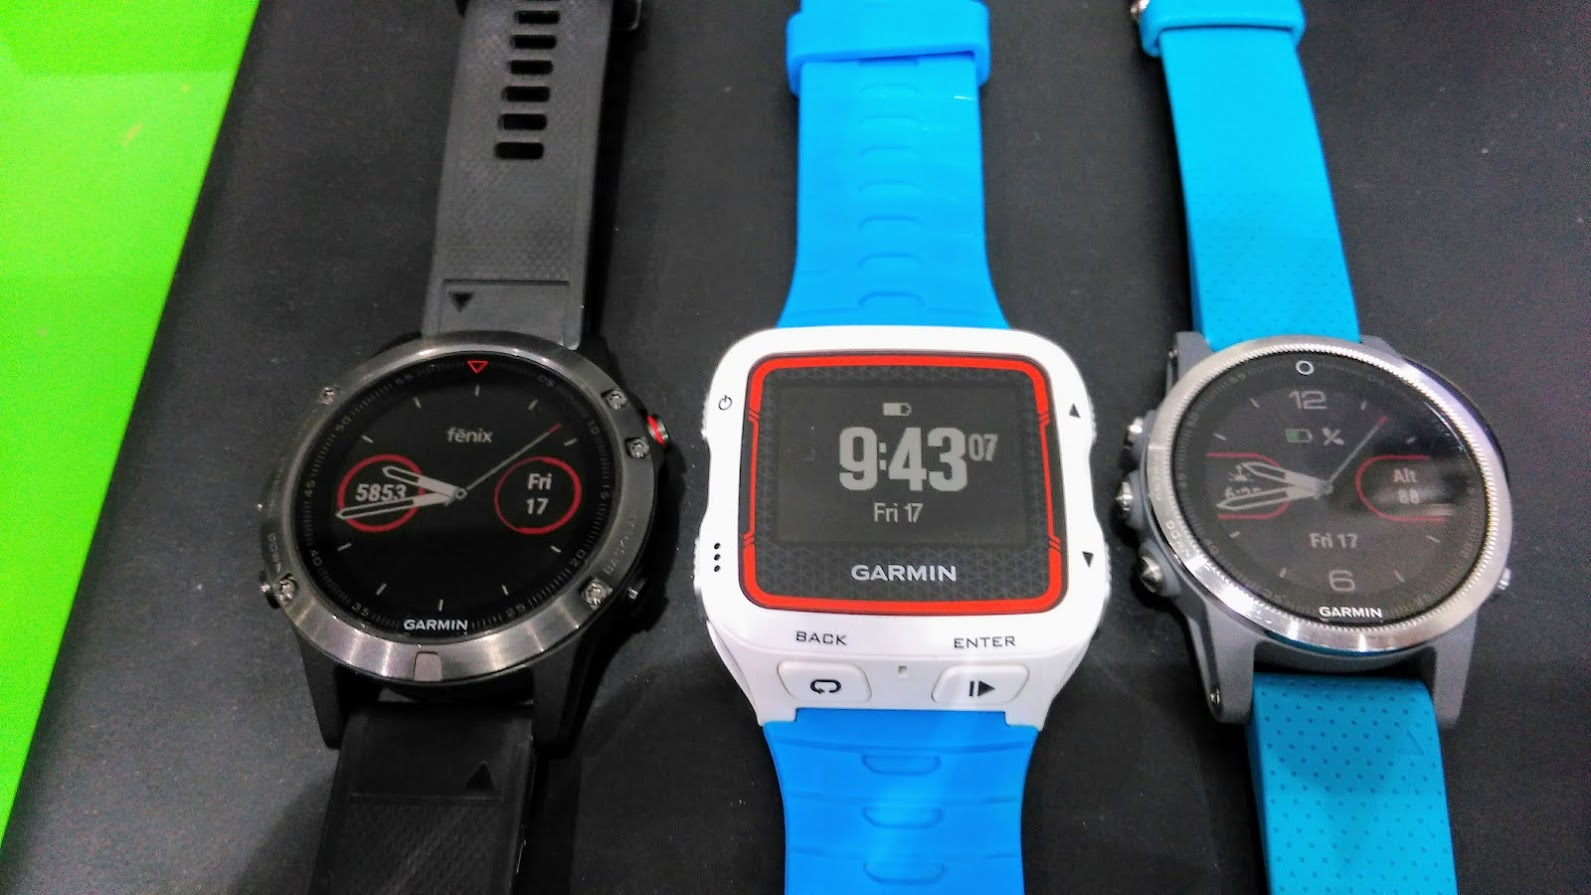 Garmin Fenix 5 - Garmin 920XT - Garmin Fenix 5S